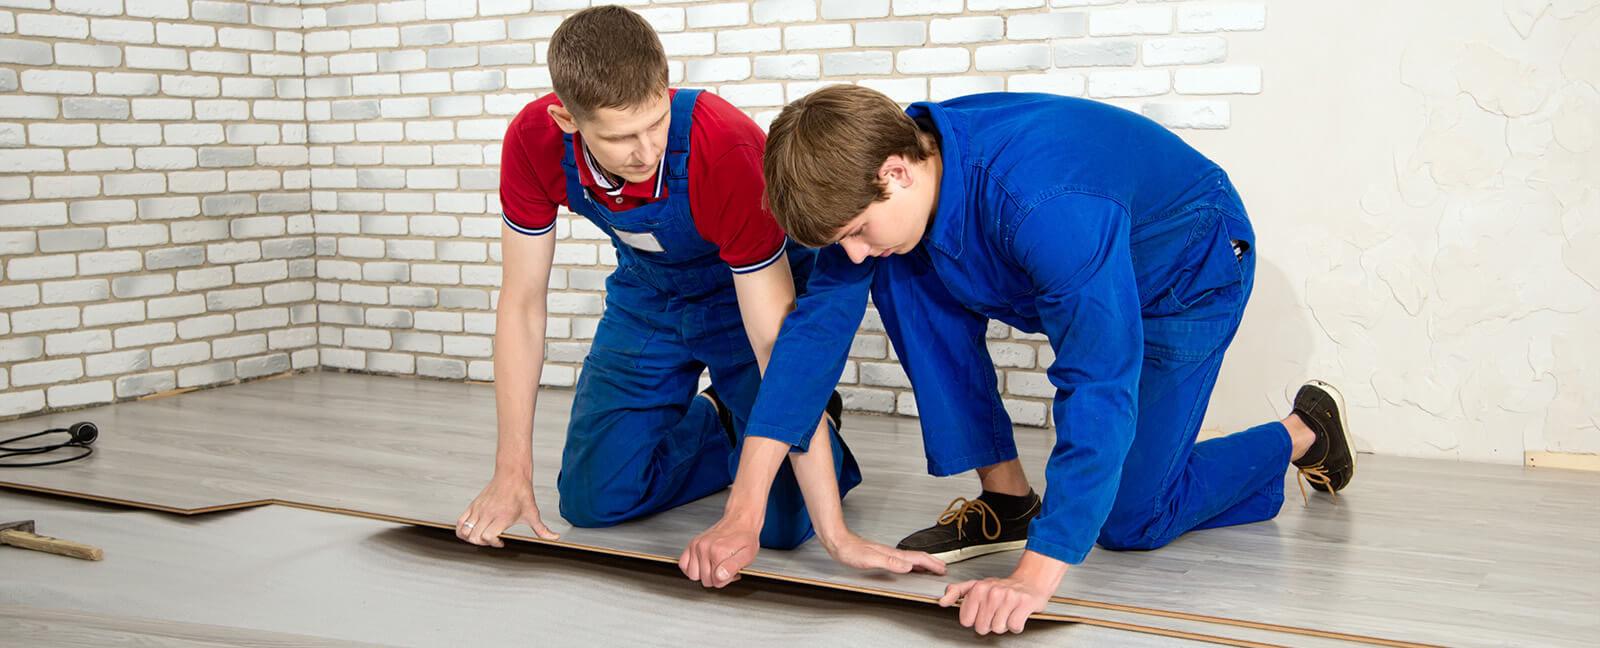 laminate floor covering e1487180018319 Внутренняя отделка домов